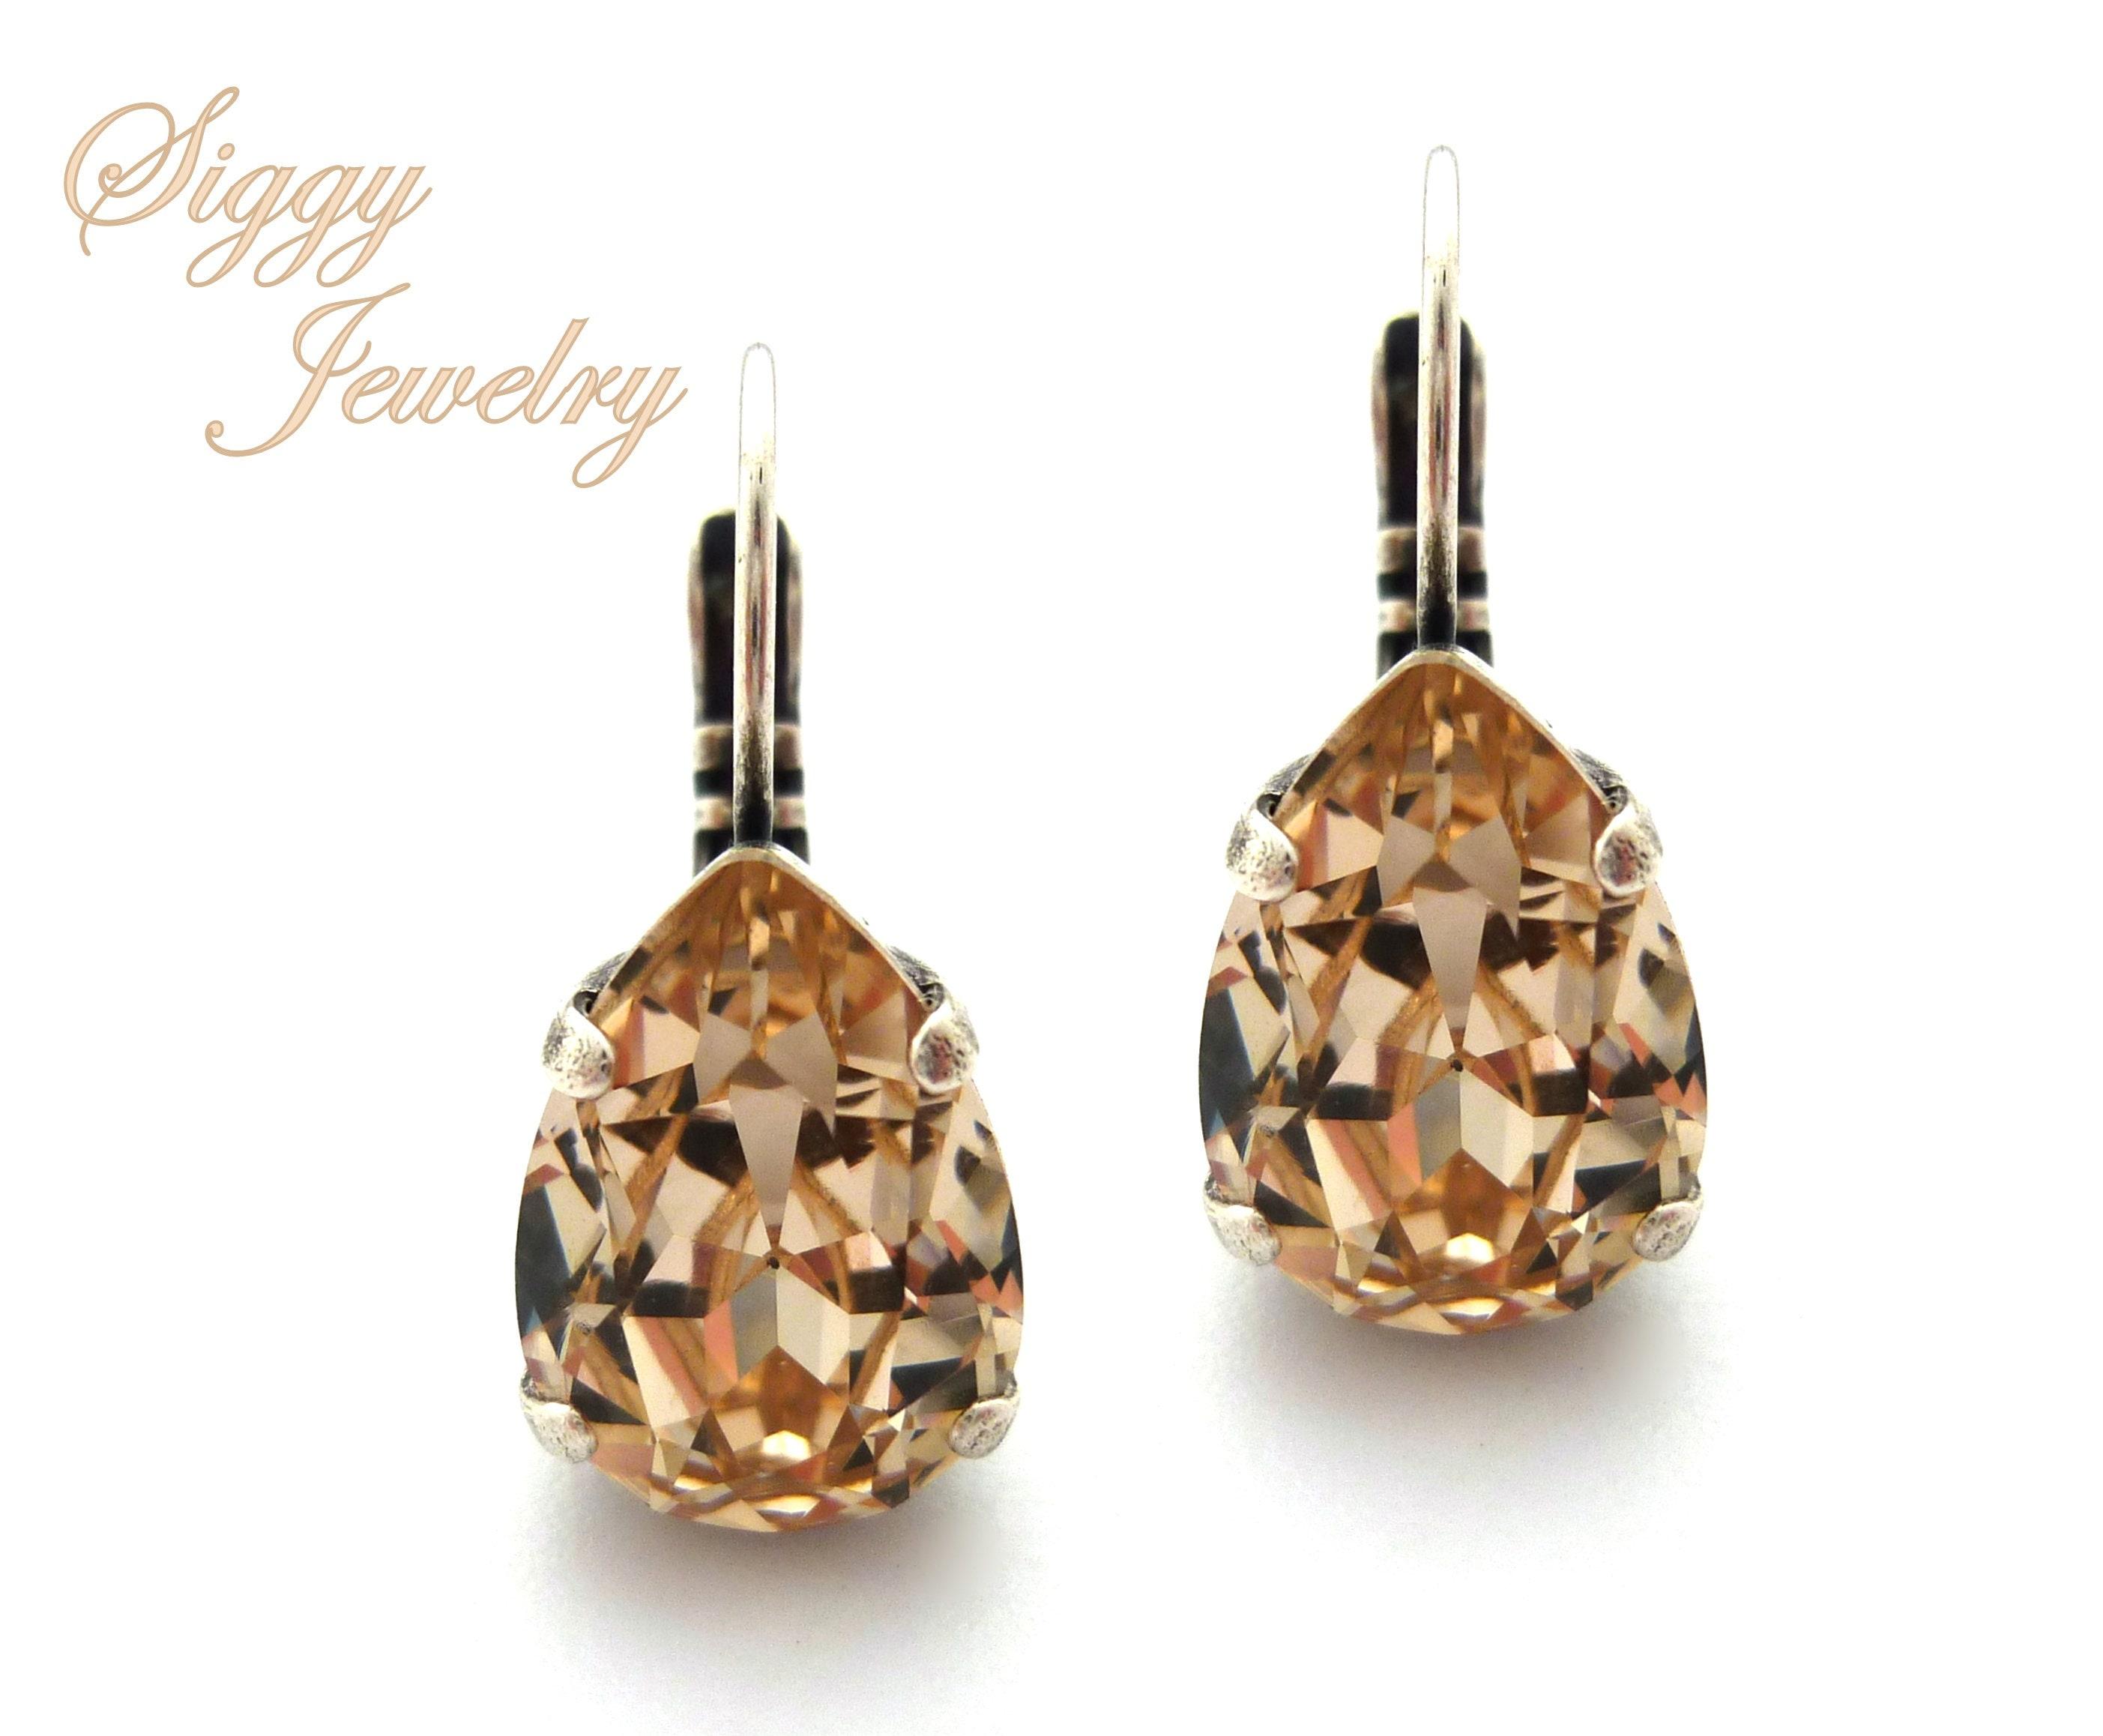 Swarovski Crystal Pear Shaped Earrings Light Silk Champagne